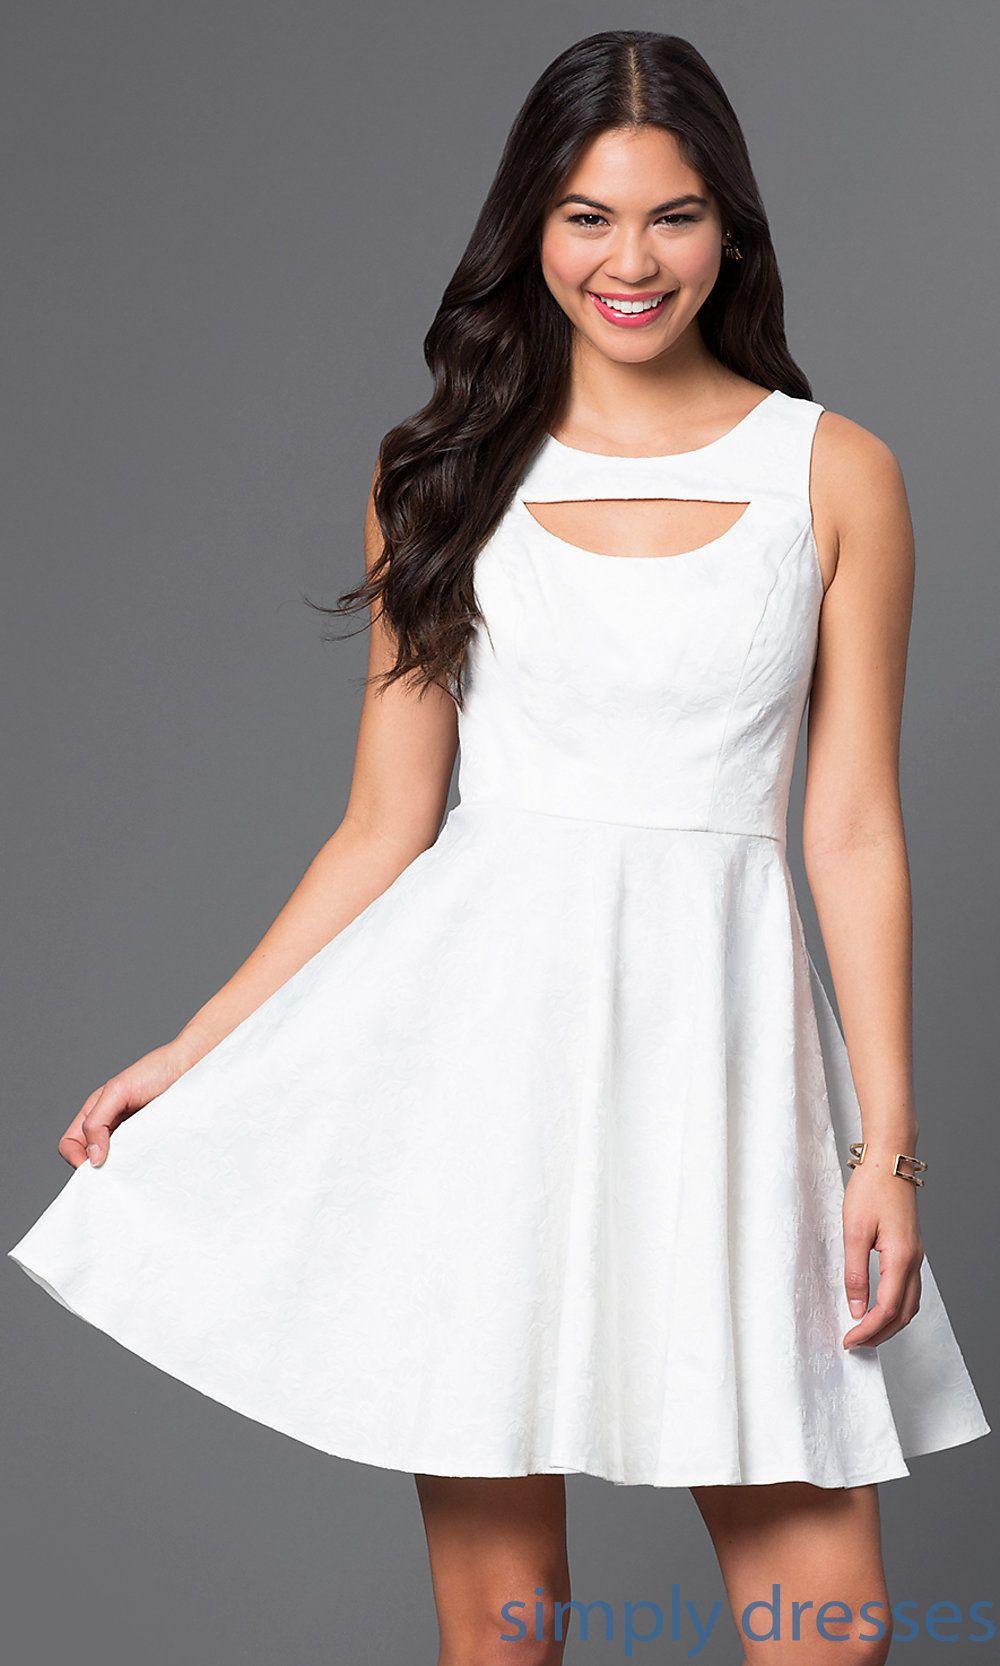 Short High Neck Dress Xoxo Short White Dresses Simply Dresses Short White Cocktail Dresses White Short Dress Dresses [ 1666 x 1000 Pixel ]